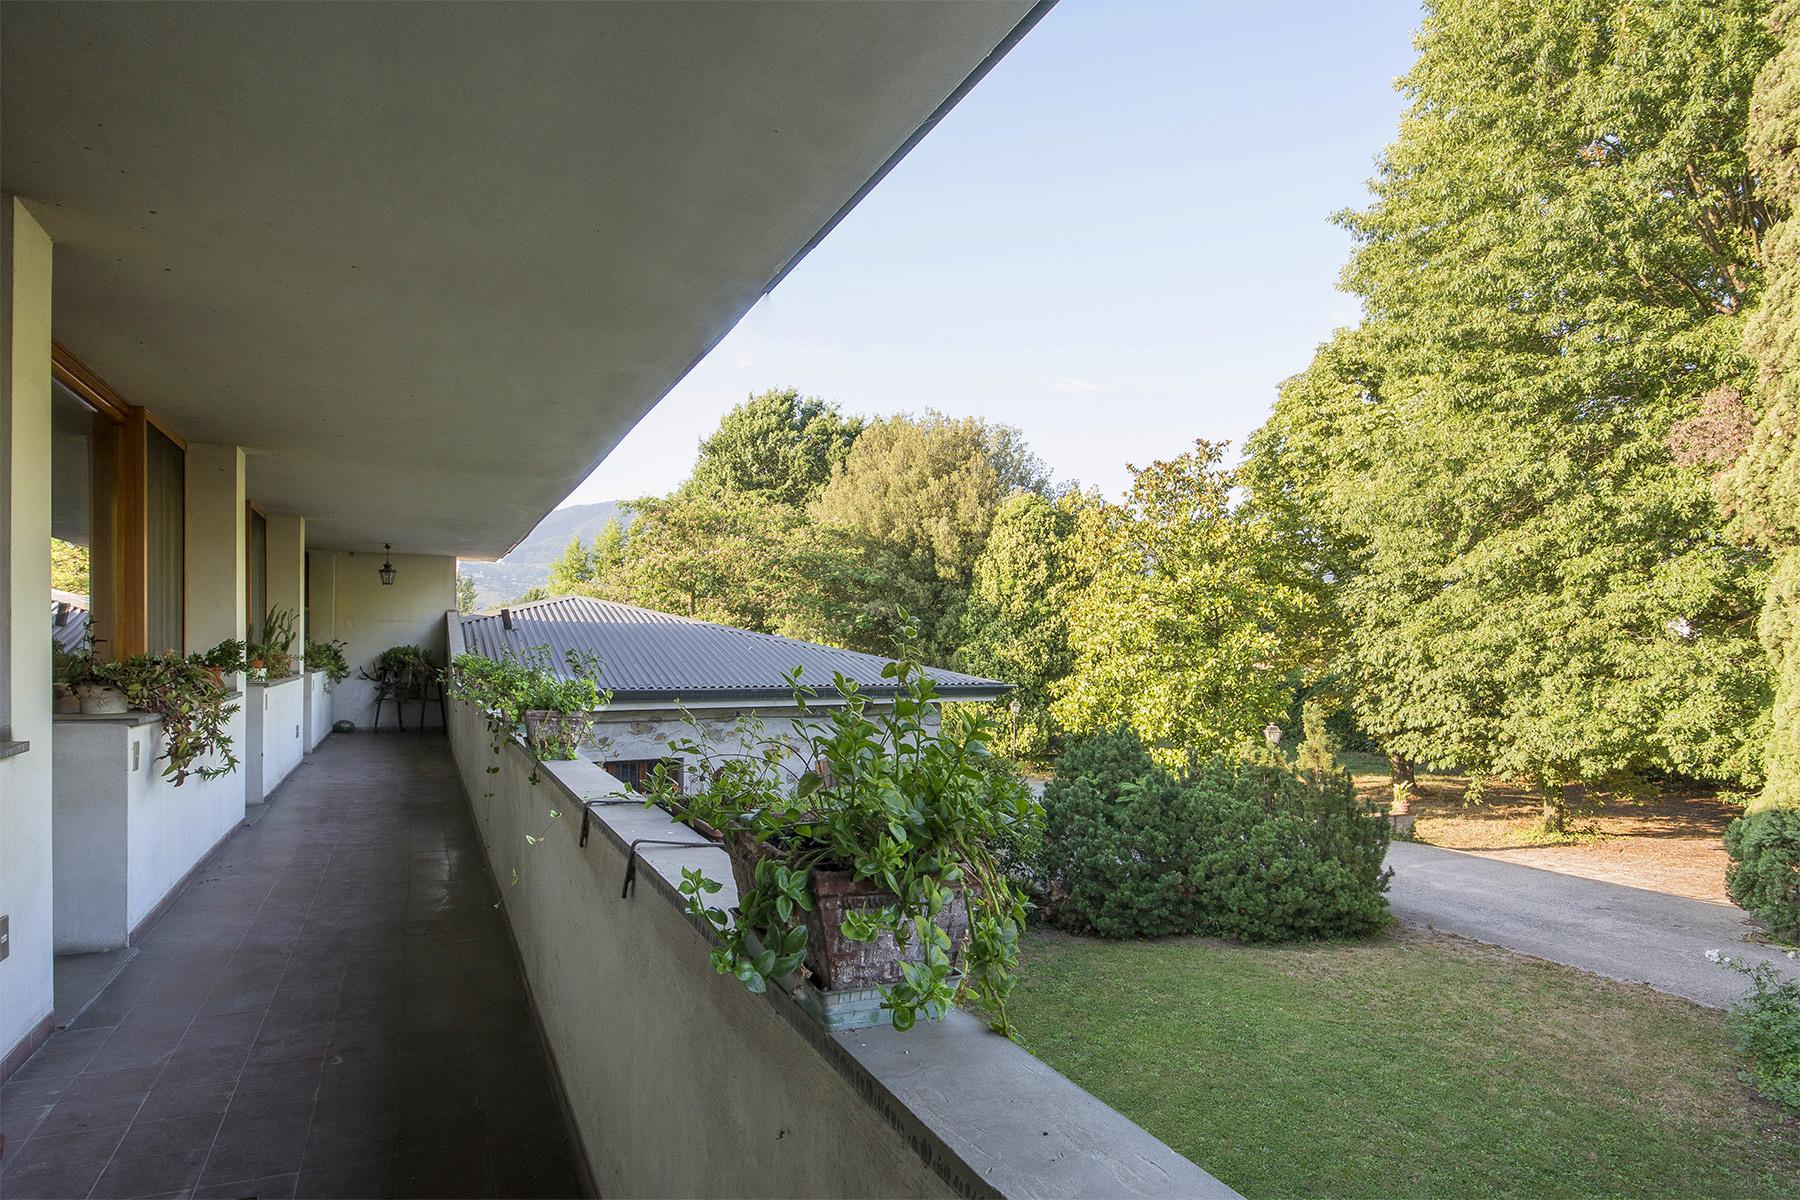 Villa in Vendita a Capannori: 5 locali, 500 mq - Foto 9